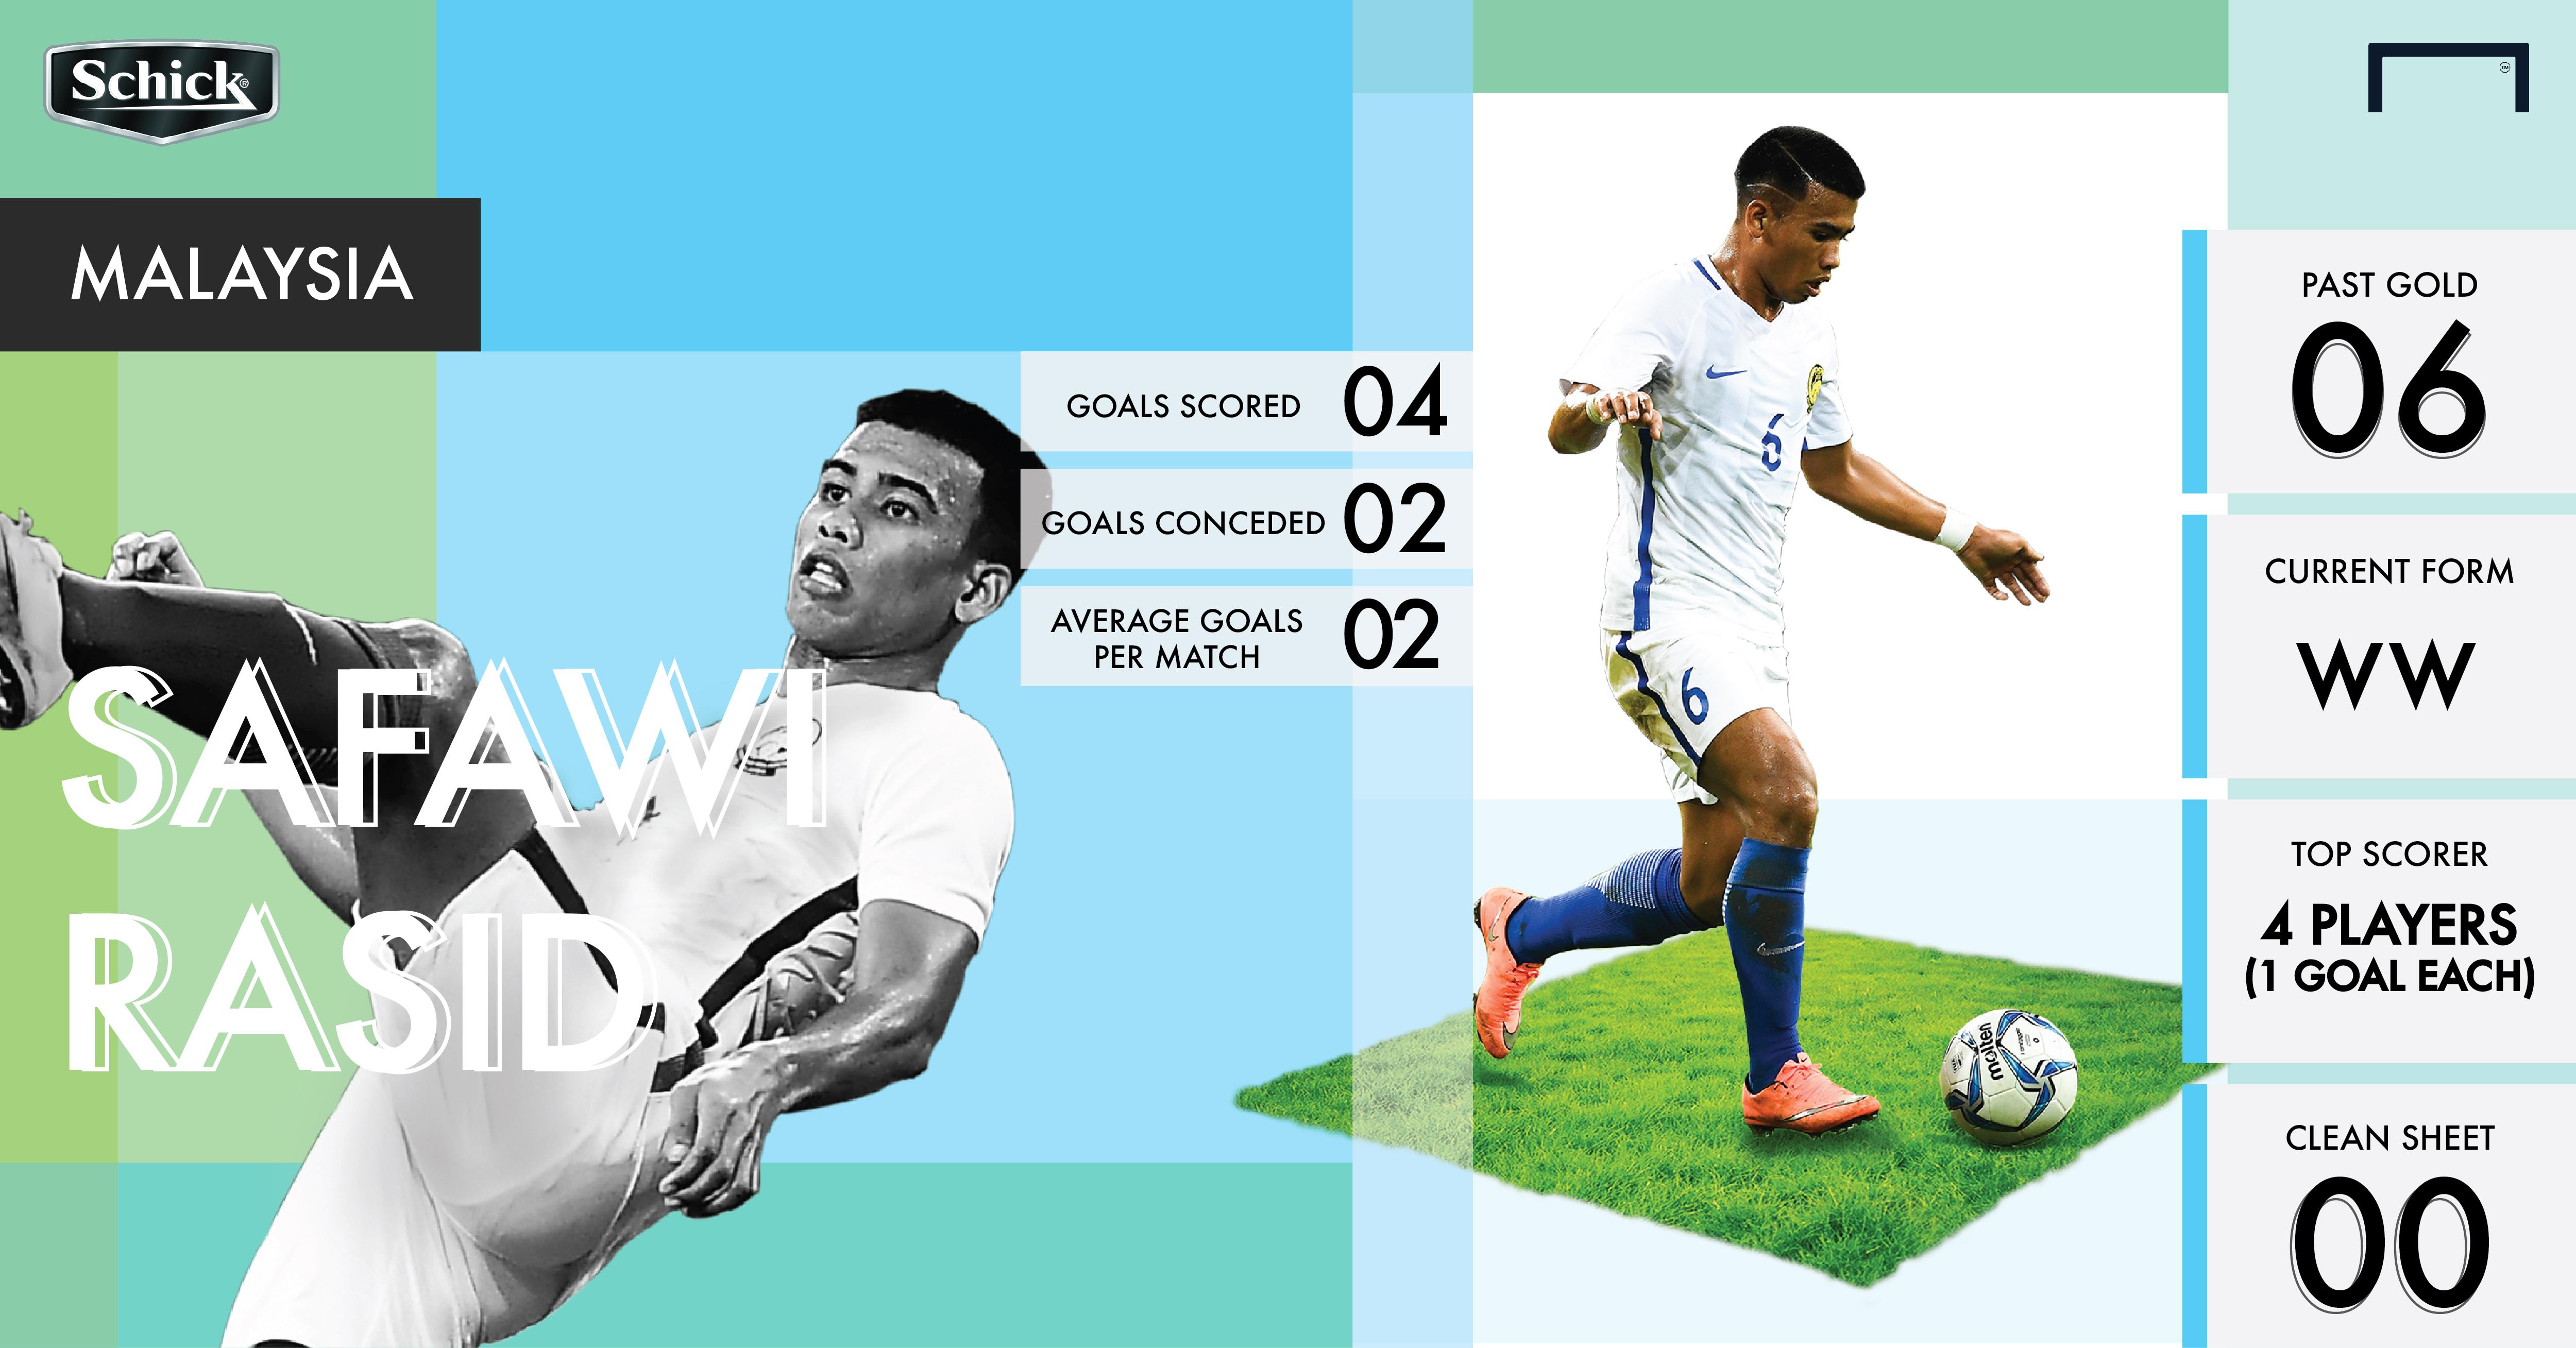 Malaysia vs Myanmar Schich infographics